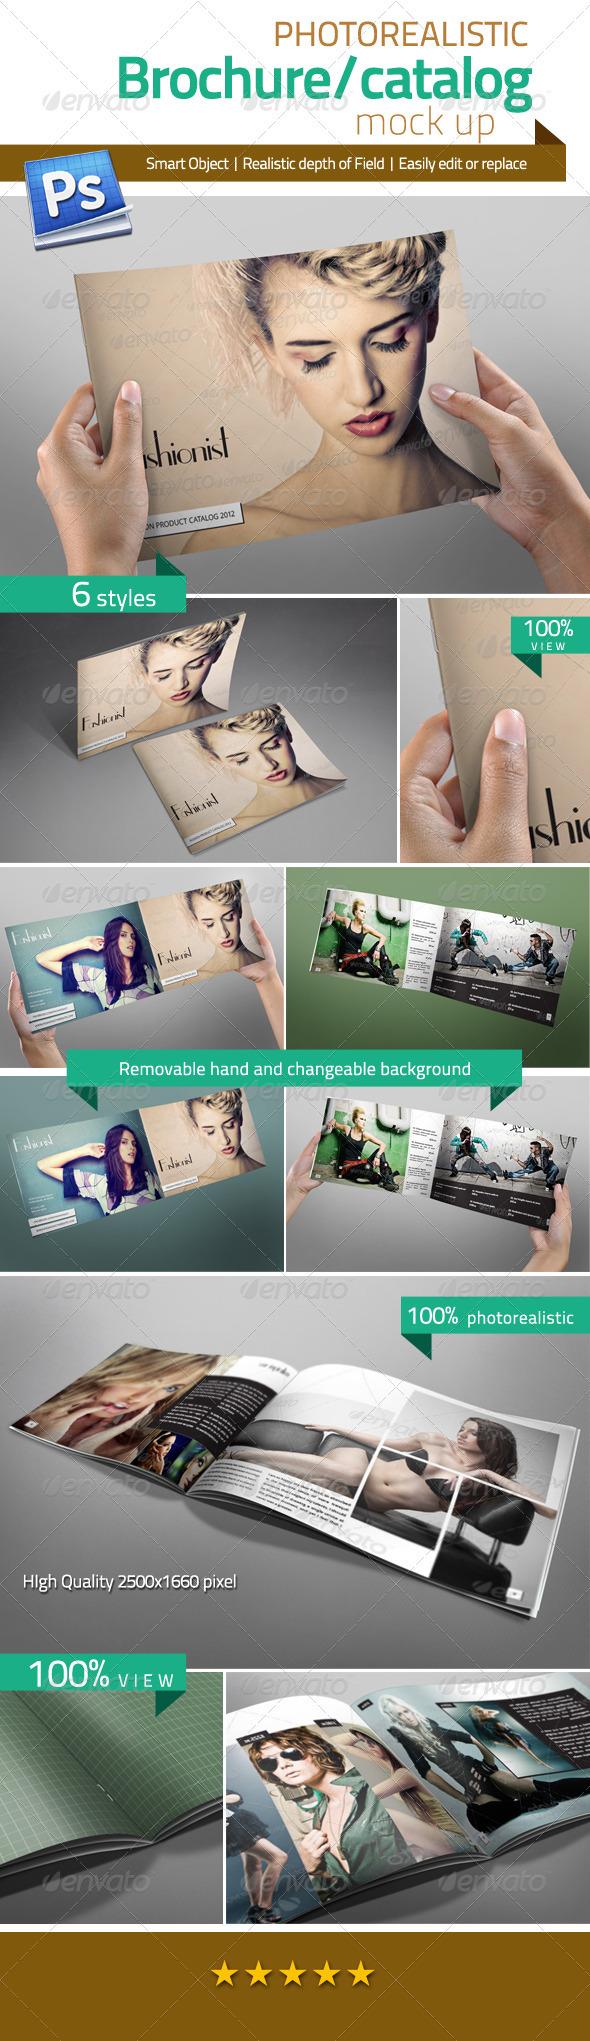 Professional Brochure/Catalog Mock Up - Brochures Print